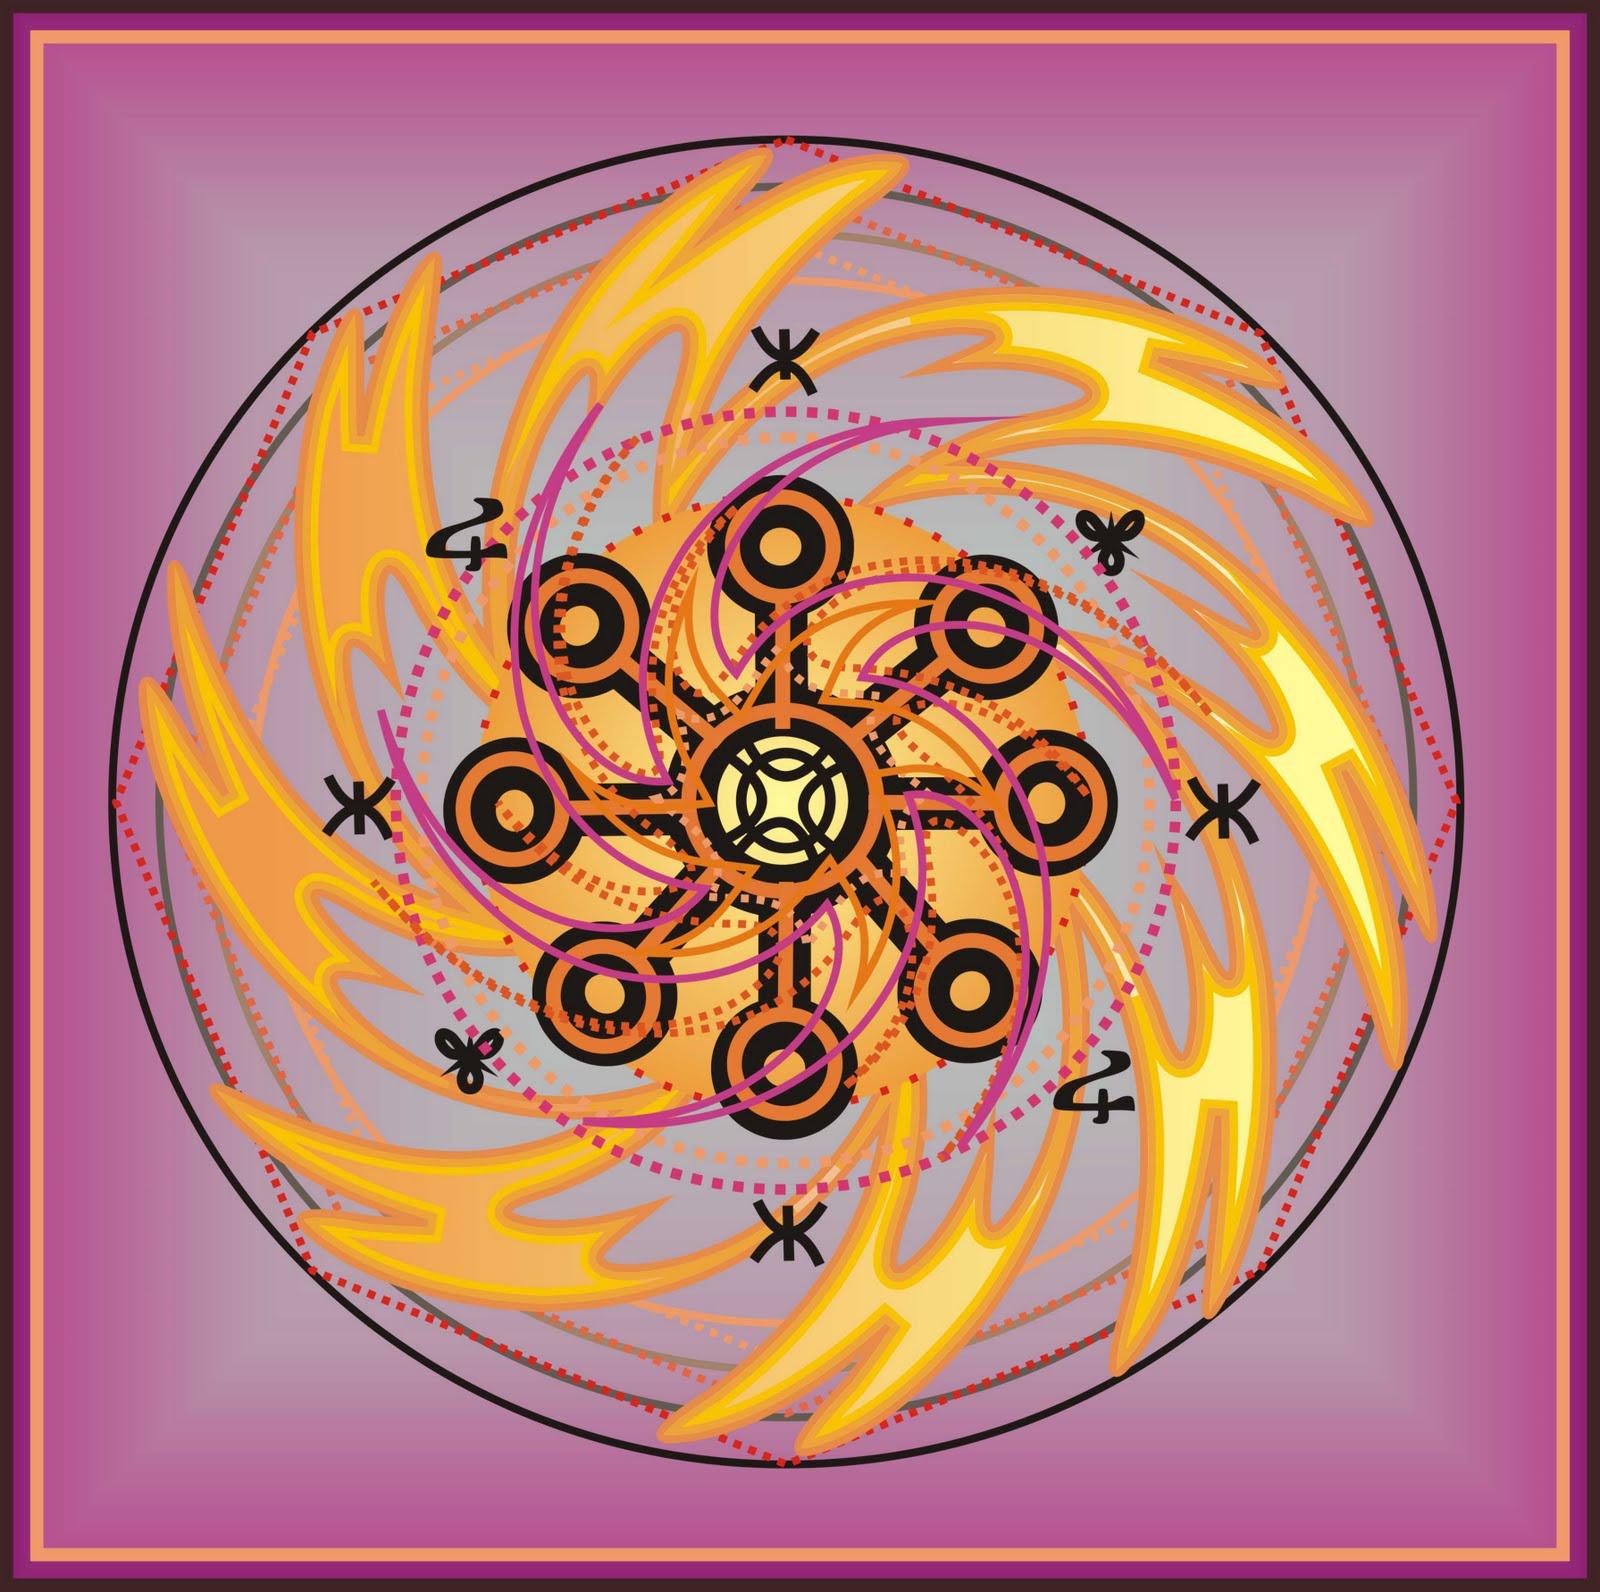 Mandala da Prosperidade